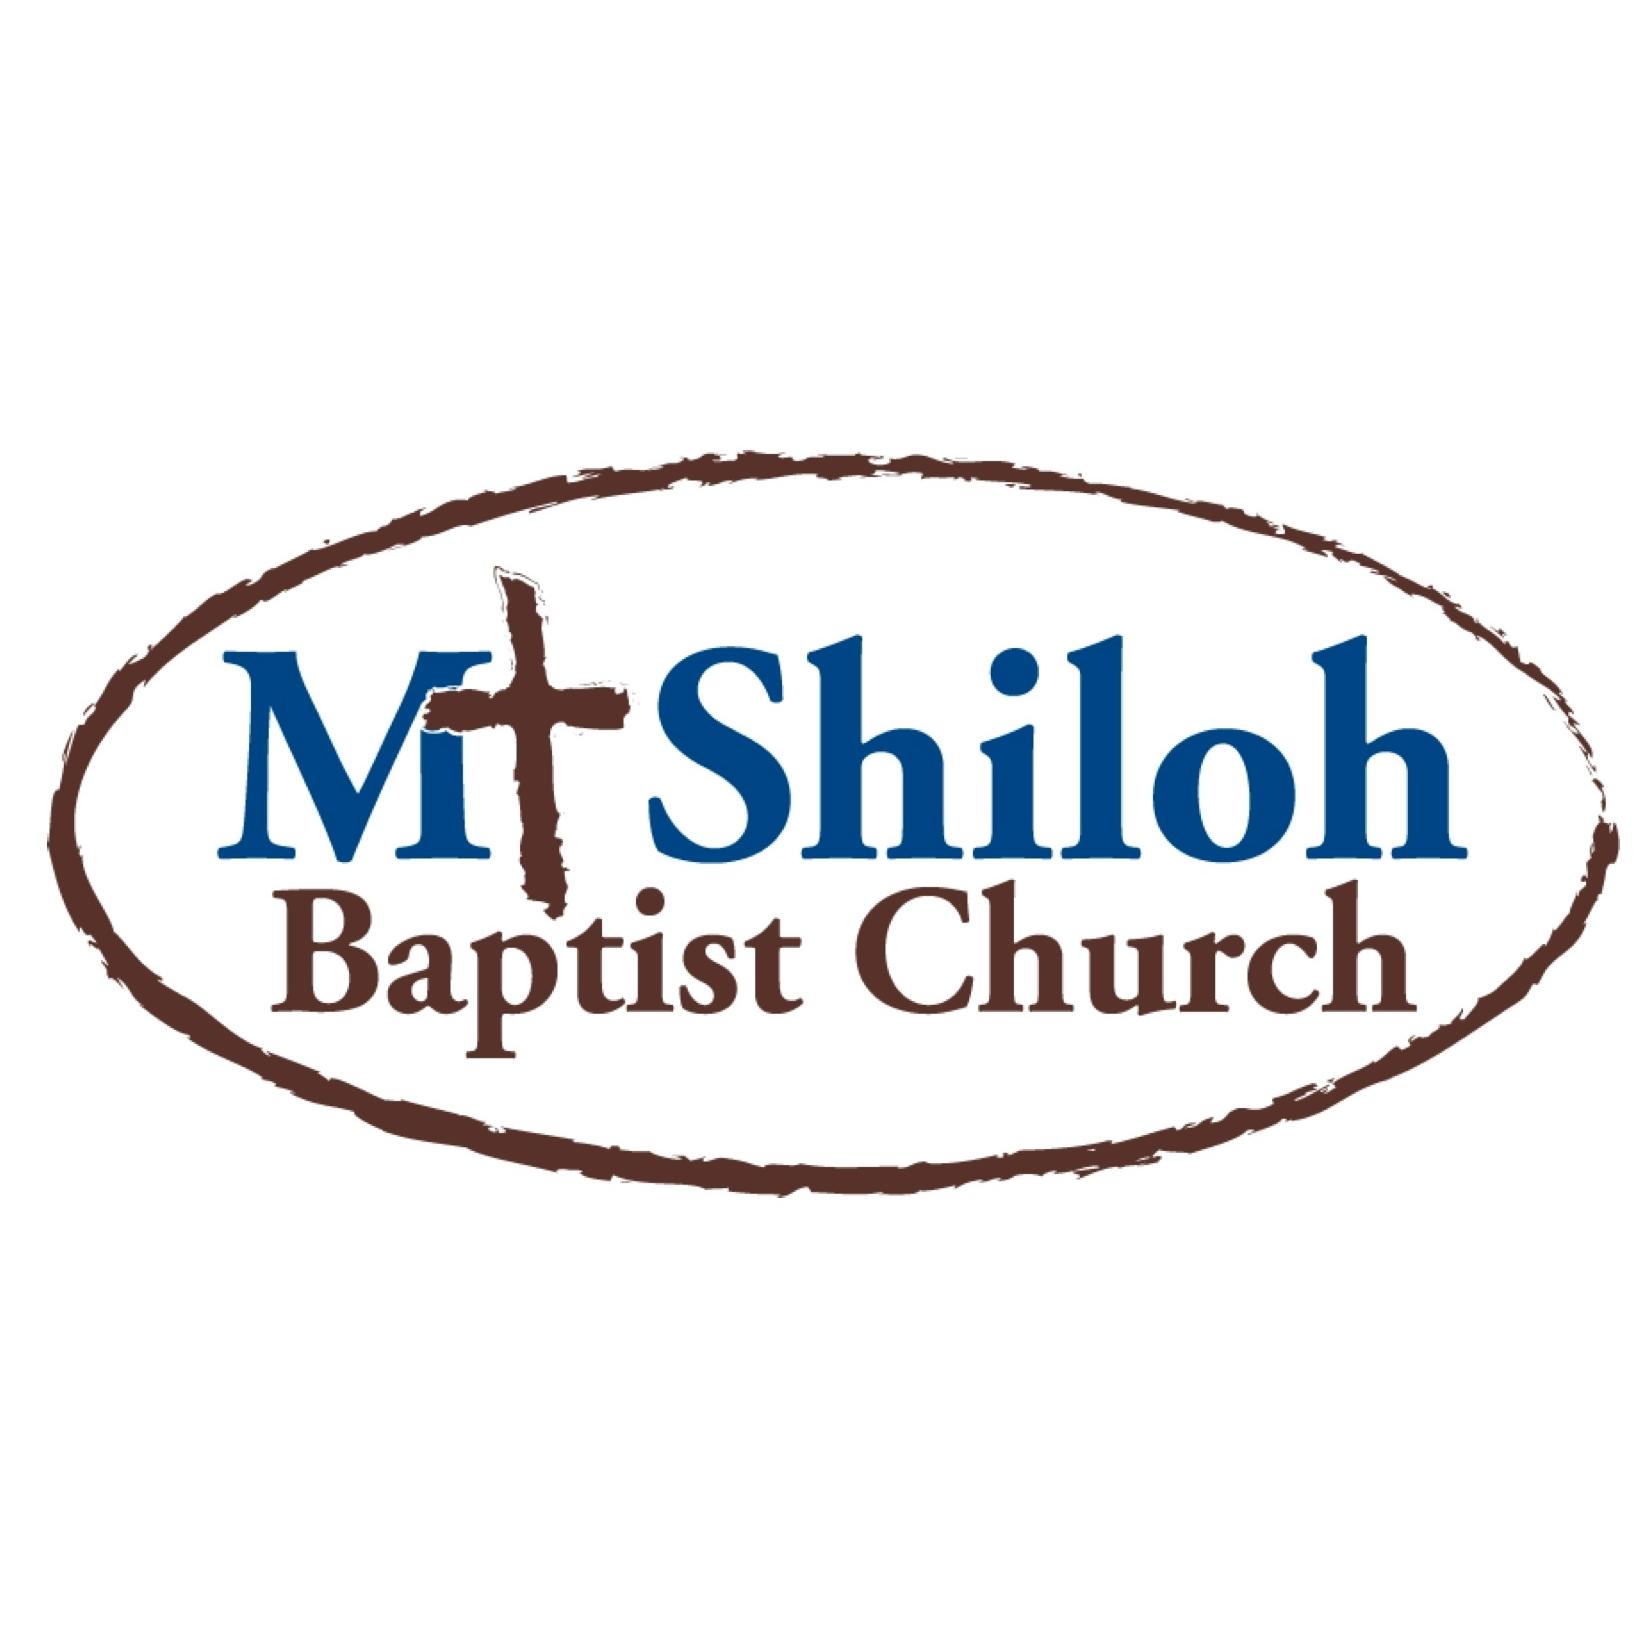 Mt Shiloh Baptist Church - Cadiz, OH - Religion